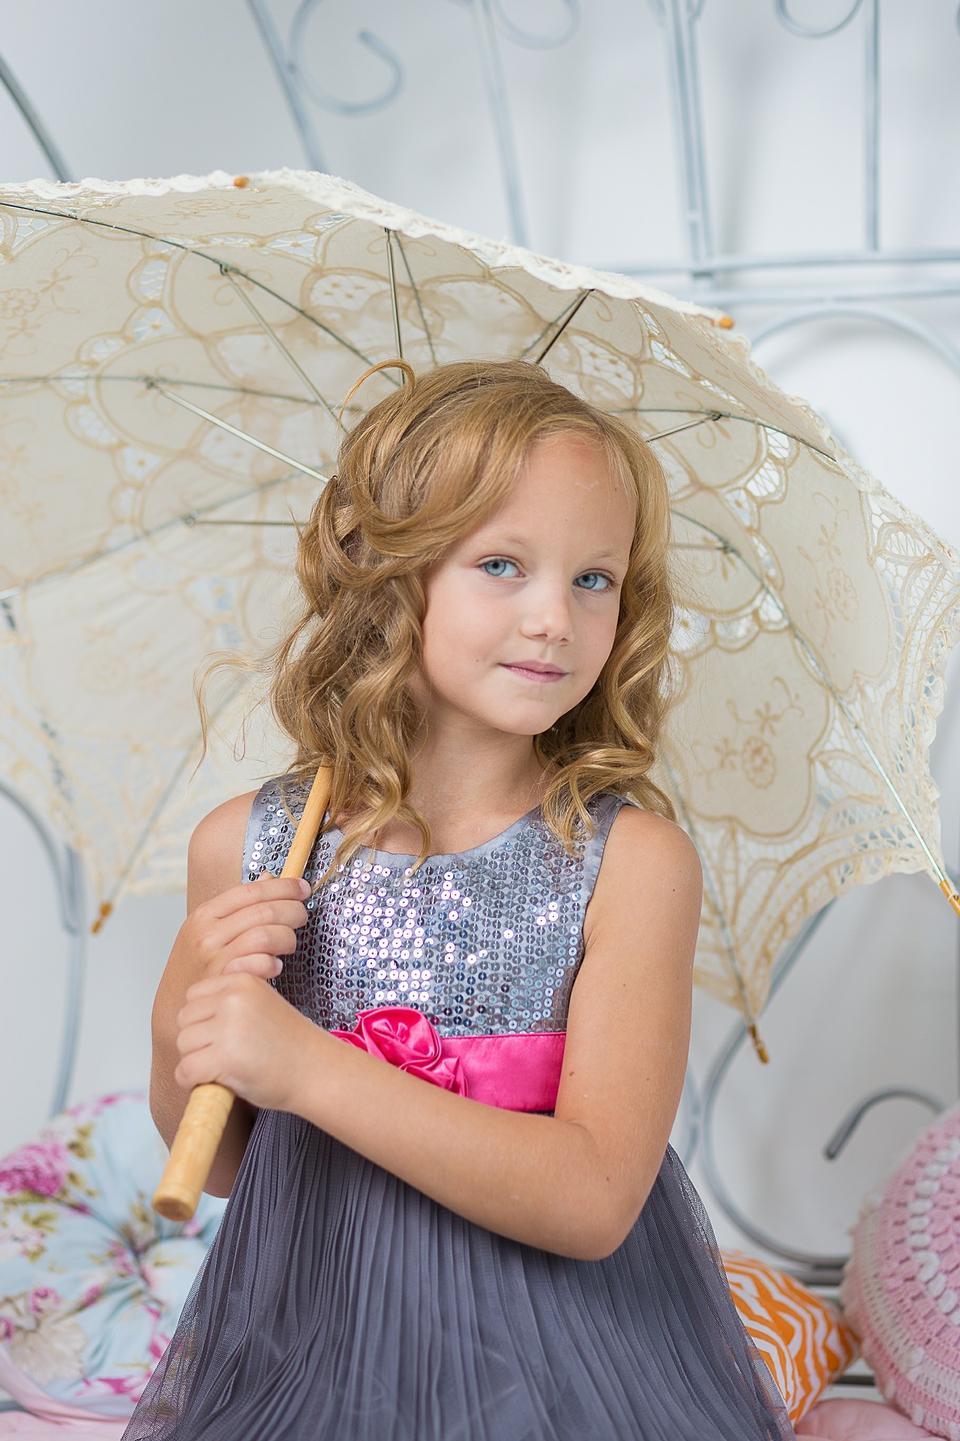 Little cute girl wear the umbrella